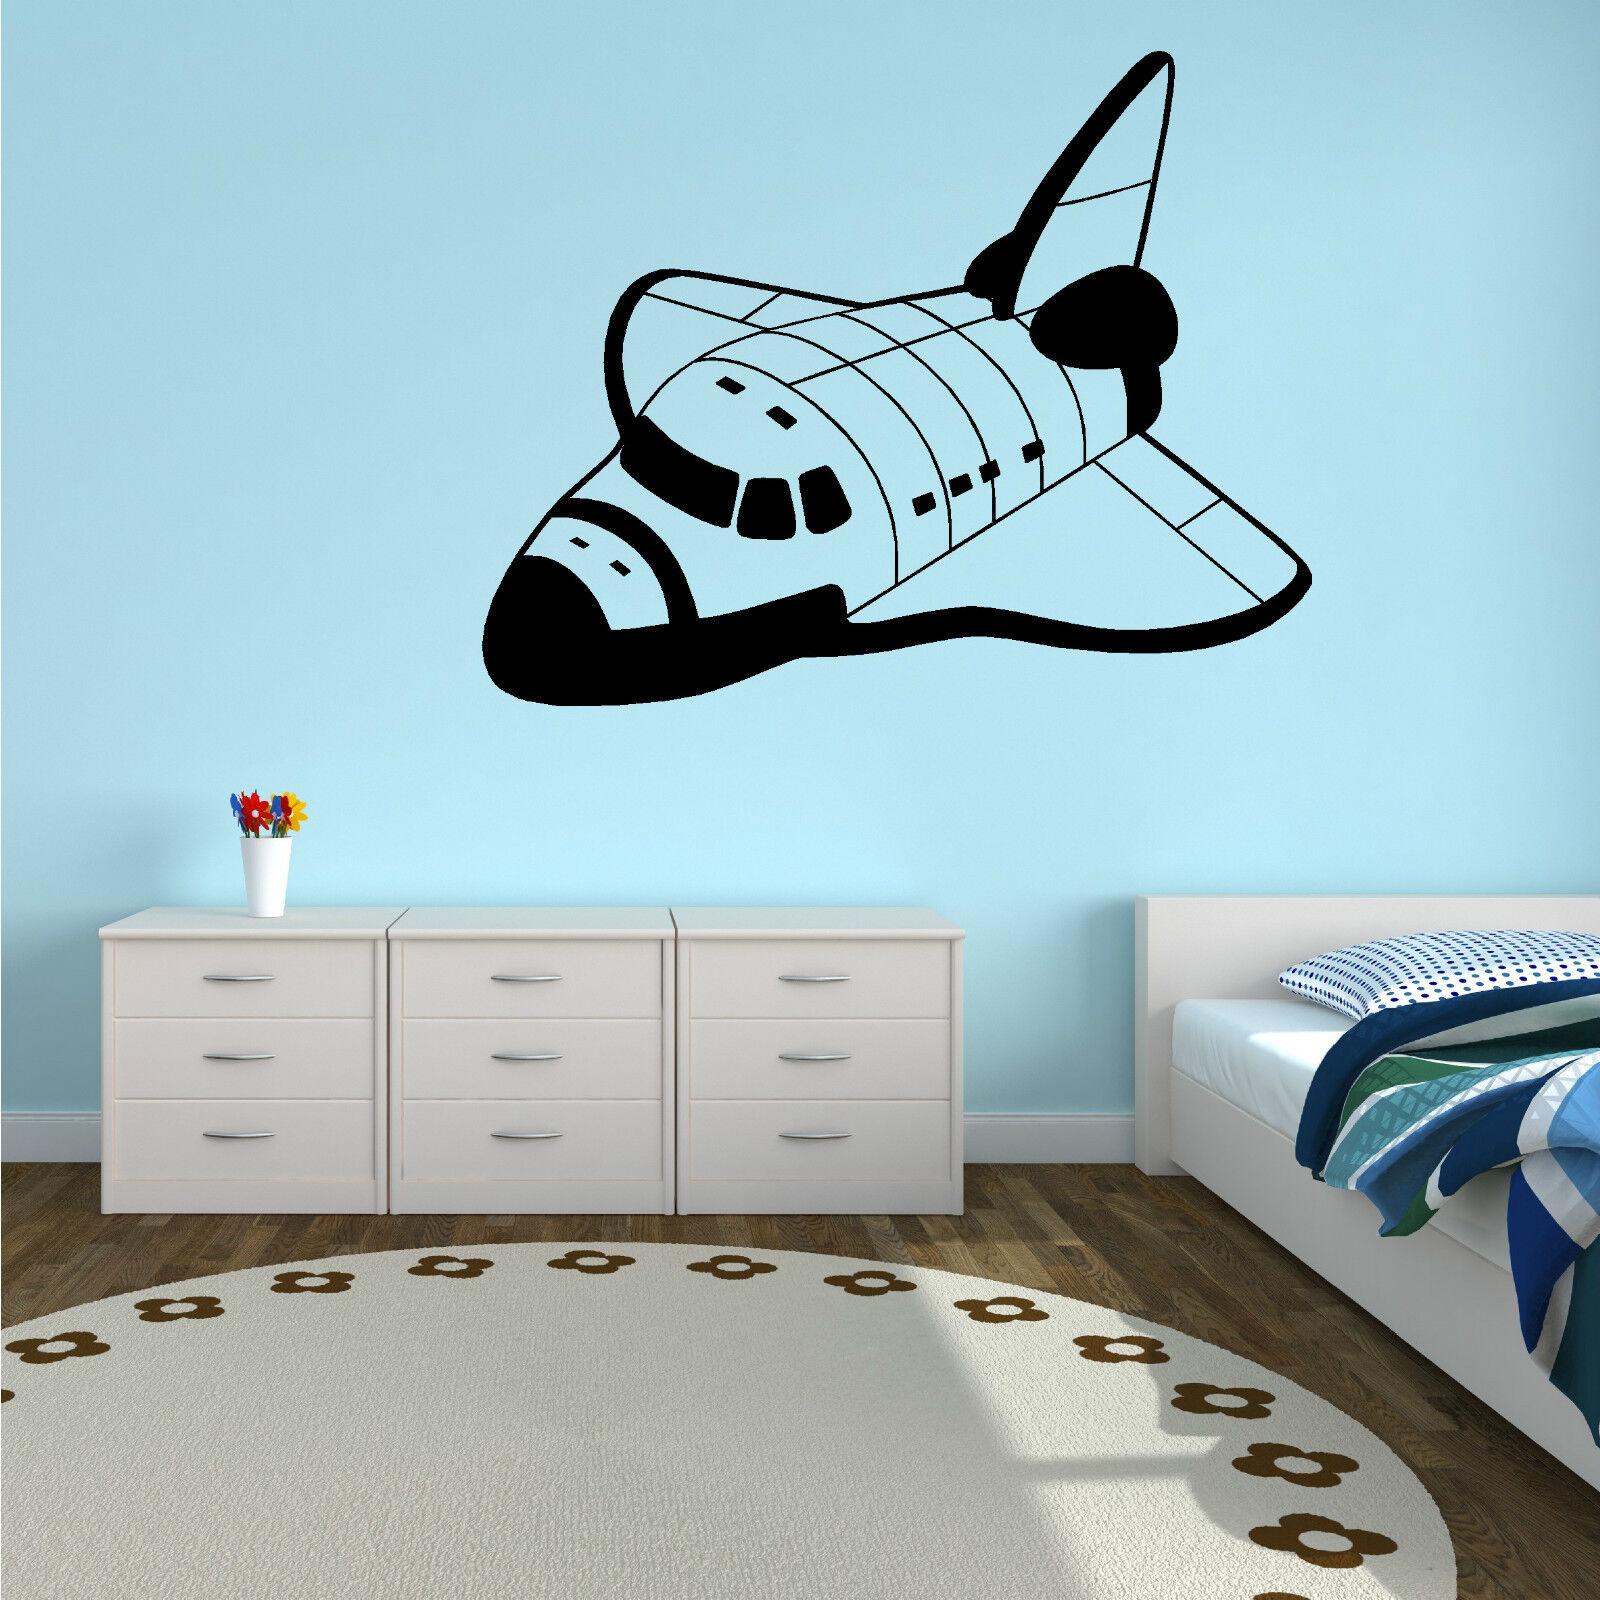 SPACE SHUTTLE N.A.S.A Vinyl Wall Art Sticker Decal Boys